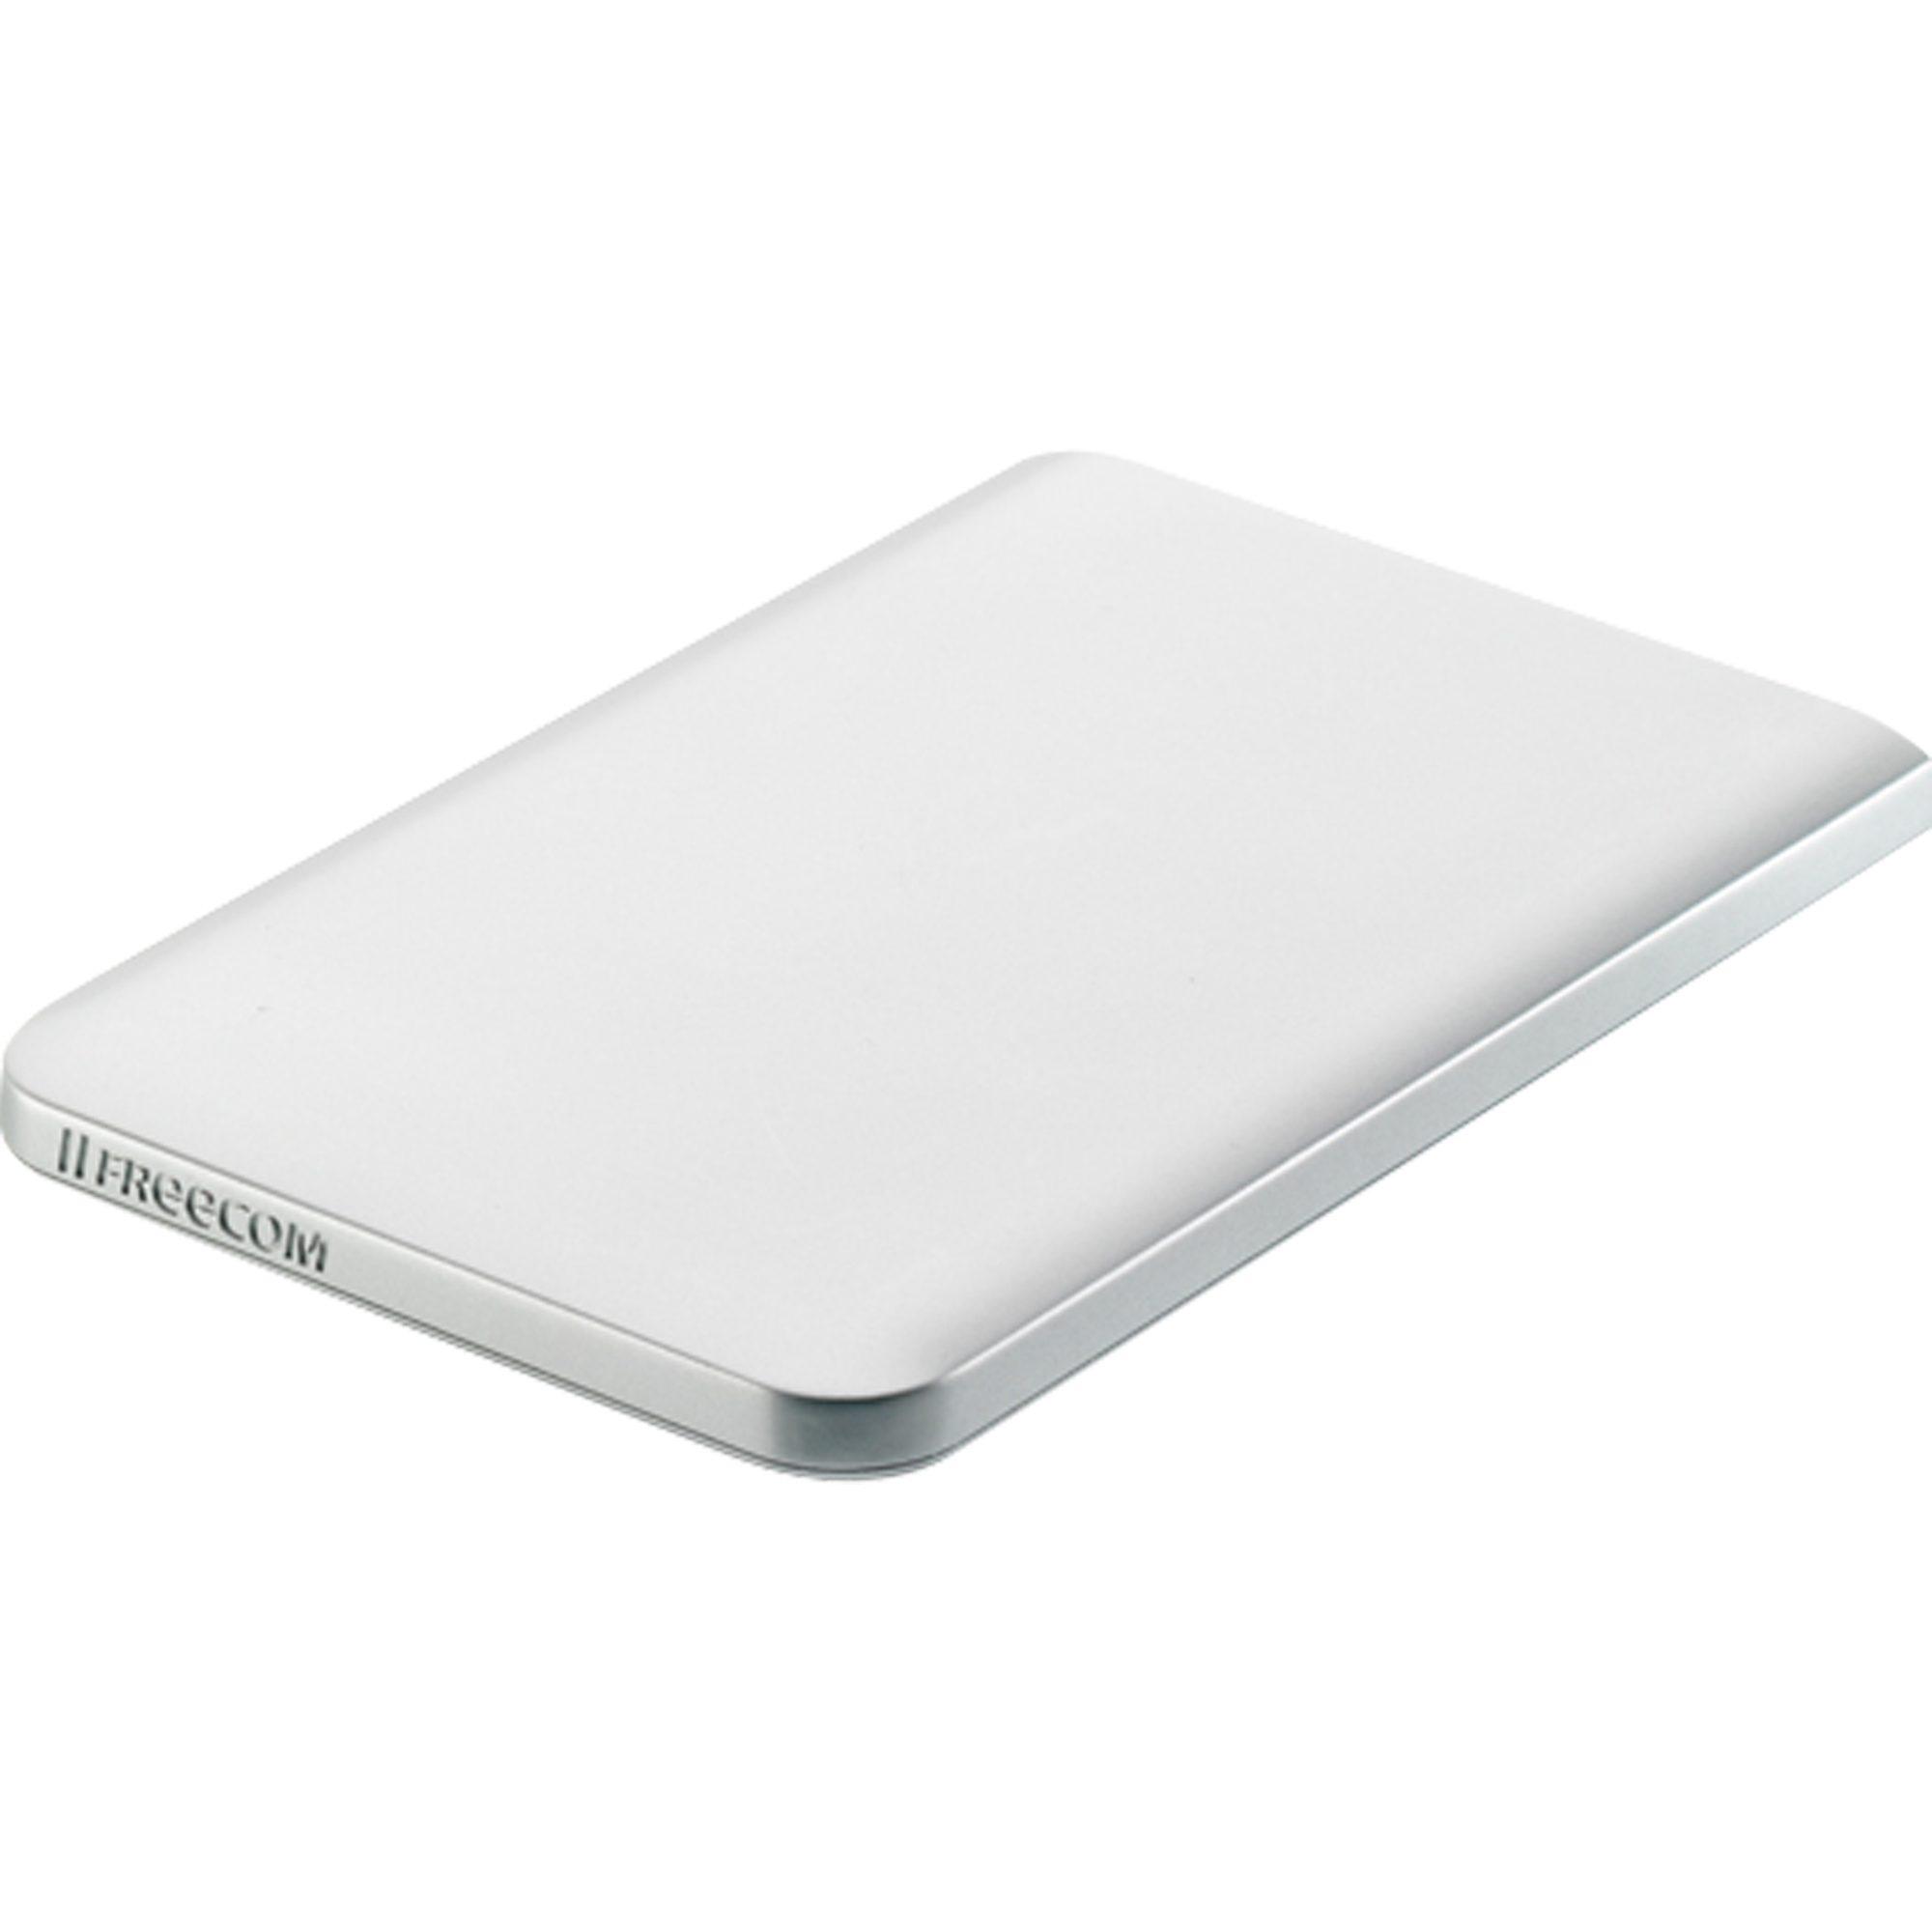 Freecom Festplatte »Mobile Drive Mg 1 TB«